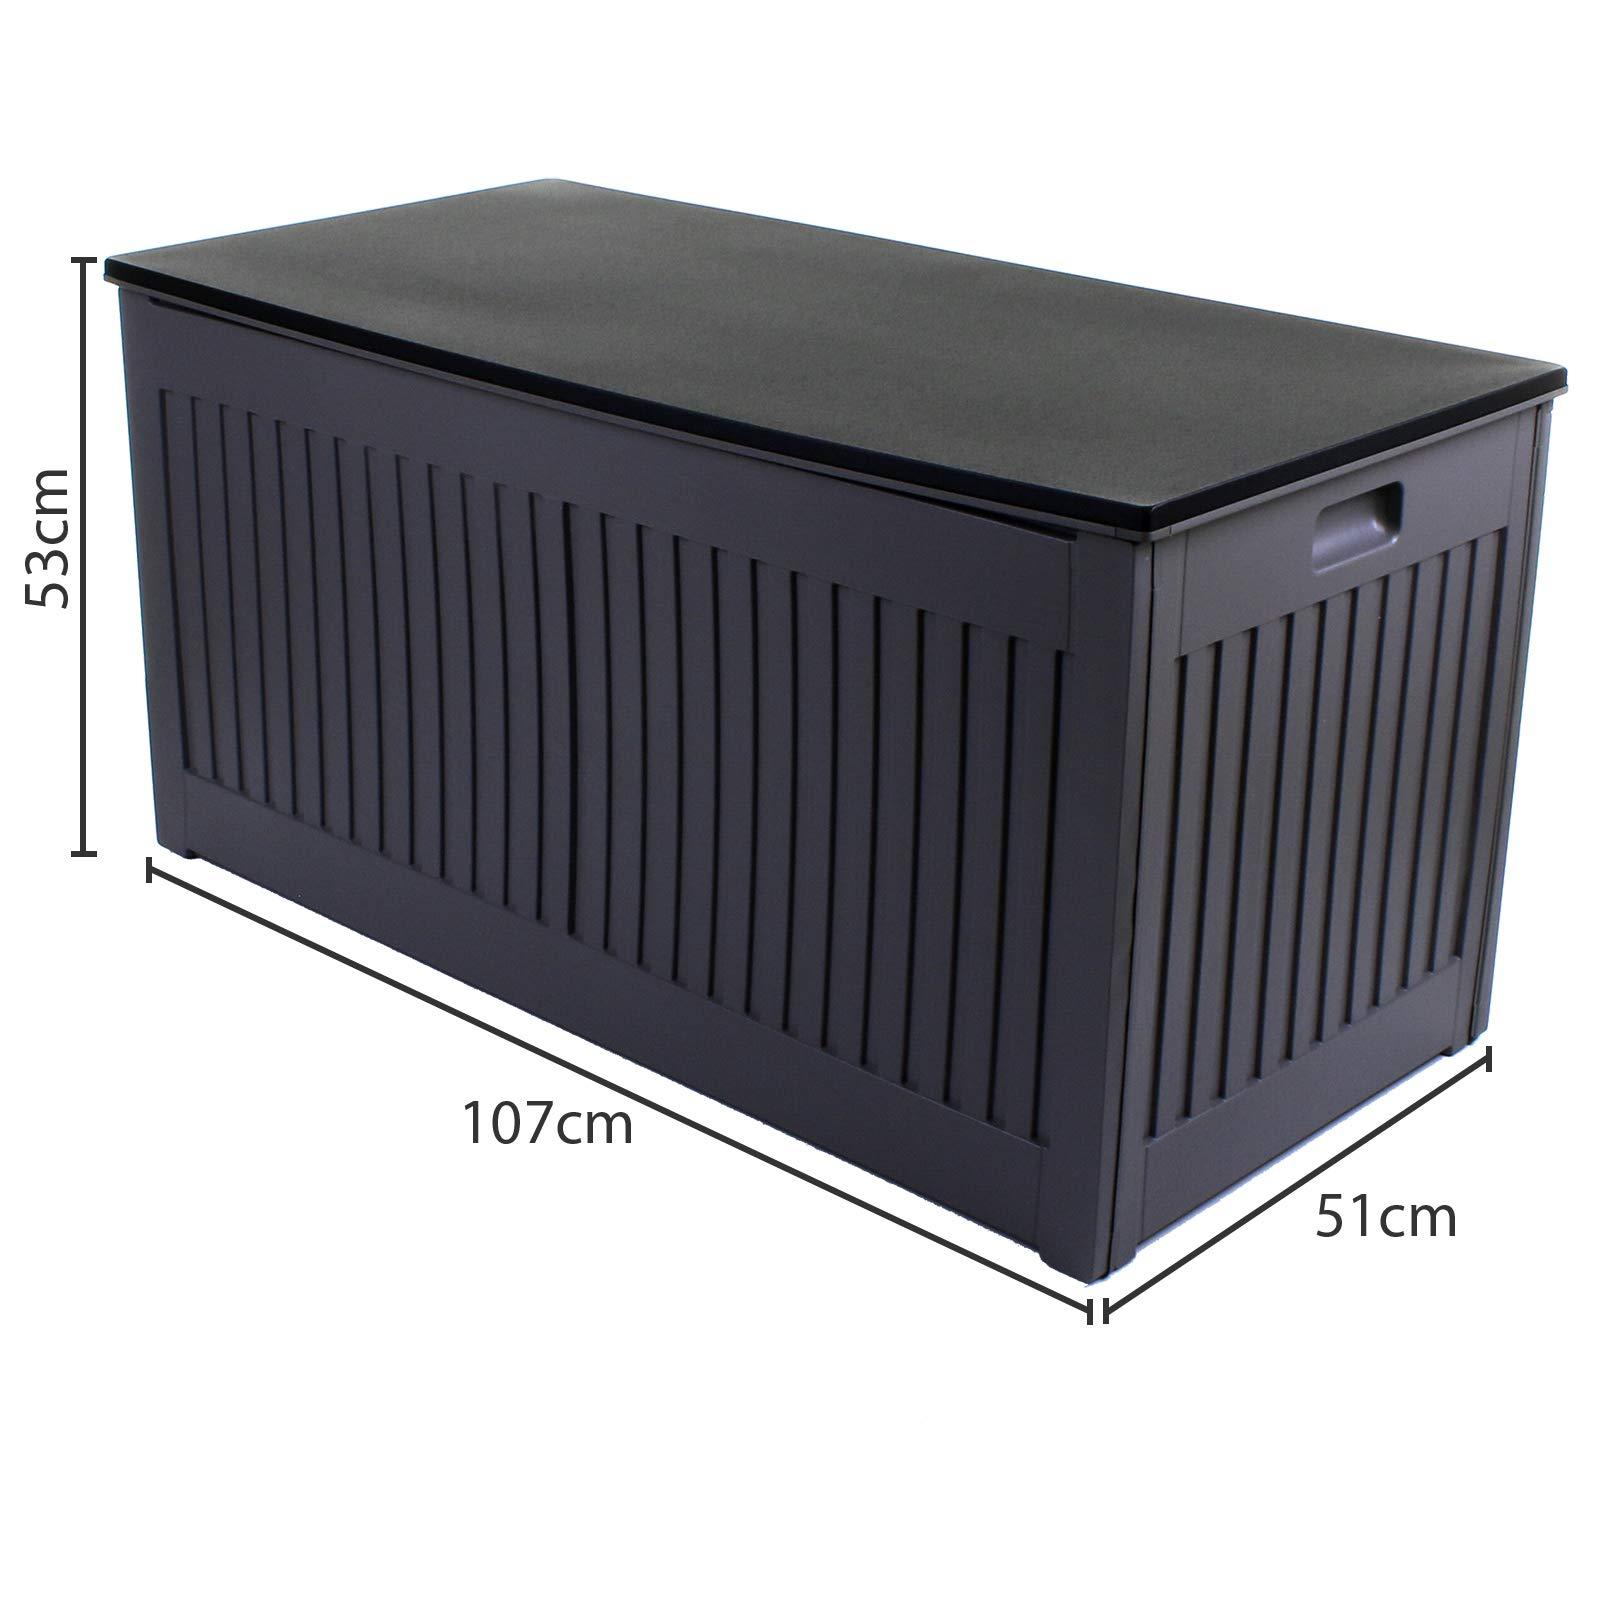 Deuba Garden Box 310L Storage Plastic Outdoor Patio Deck Chest Grey